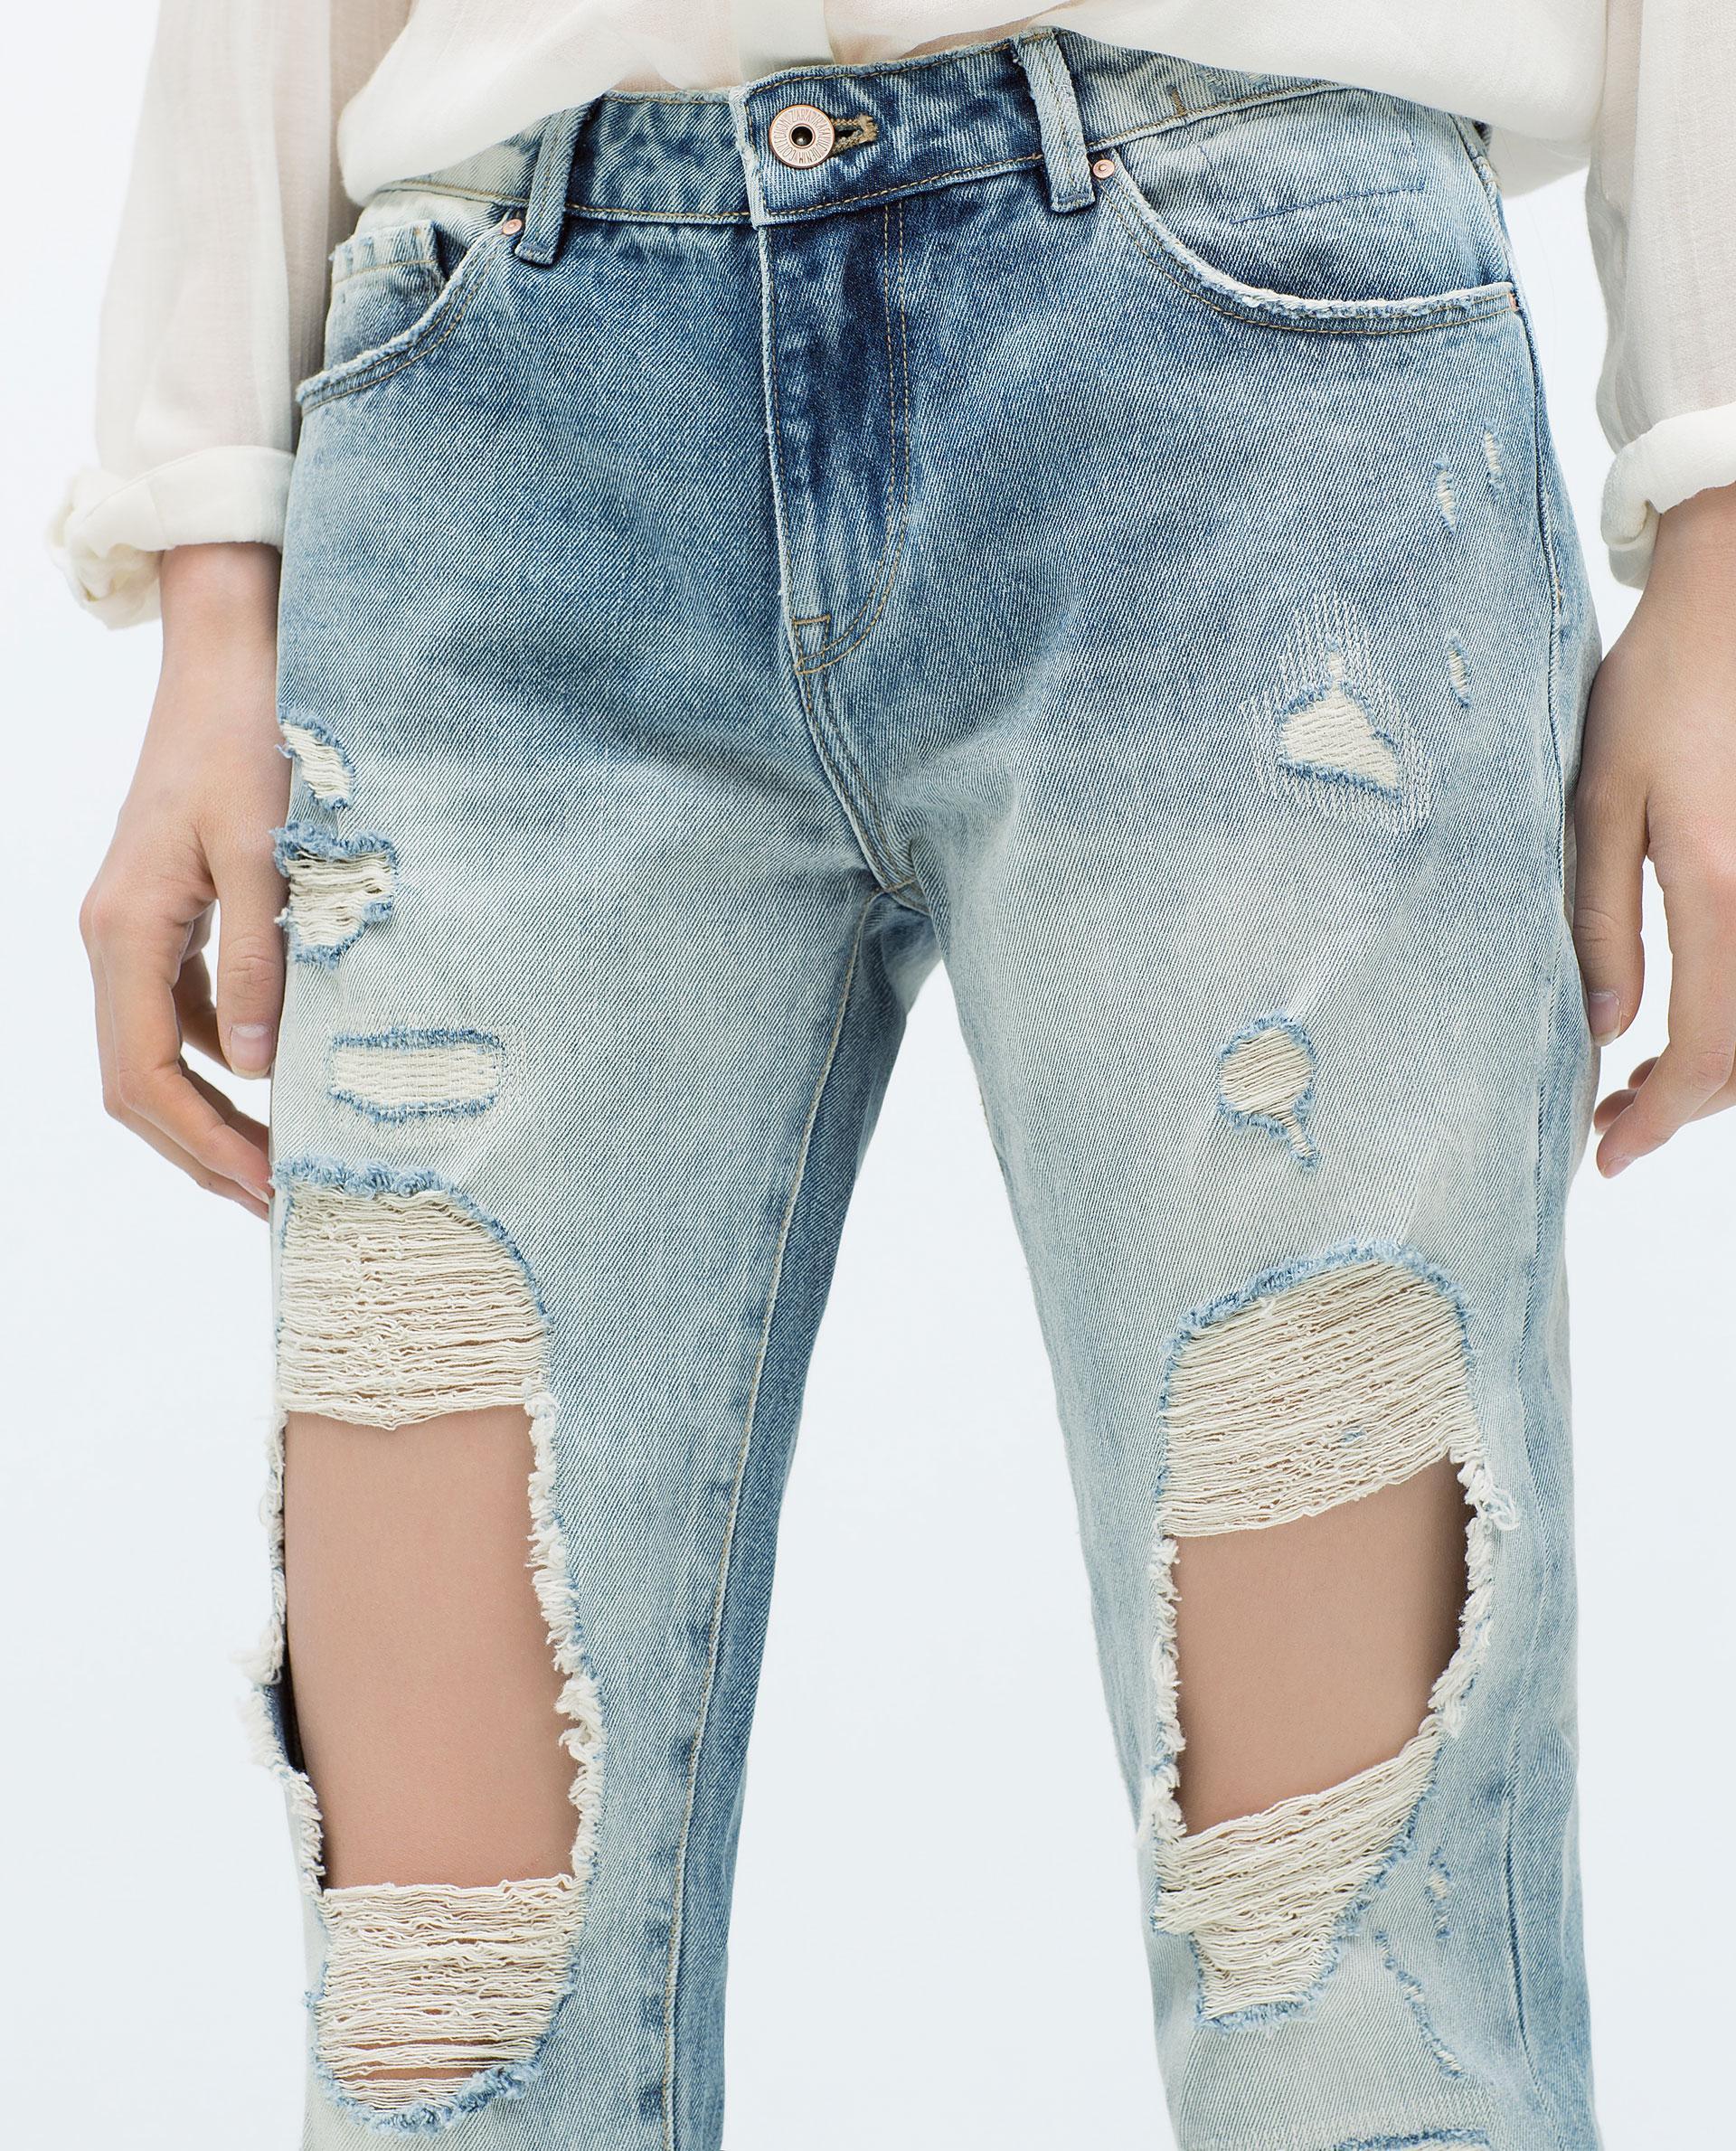 Excellent DamagedJeansWOMAN  ZARA United States  Outfits  Pinterest  Zara